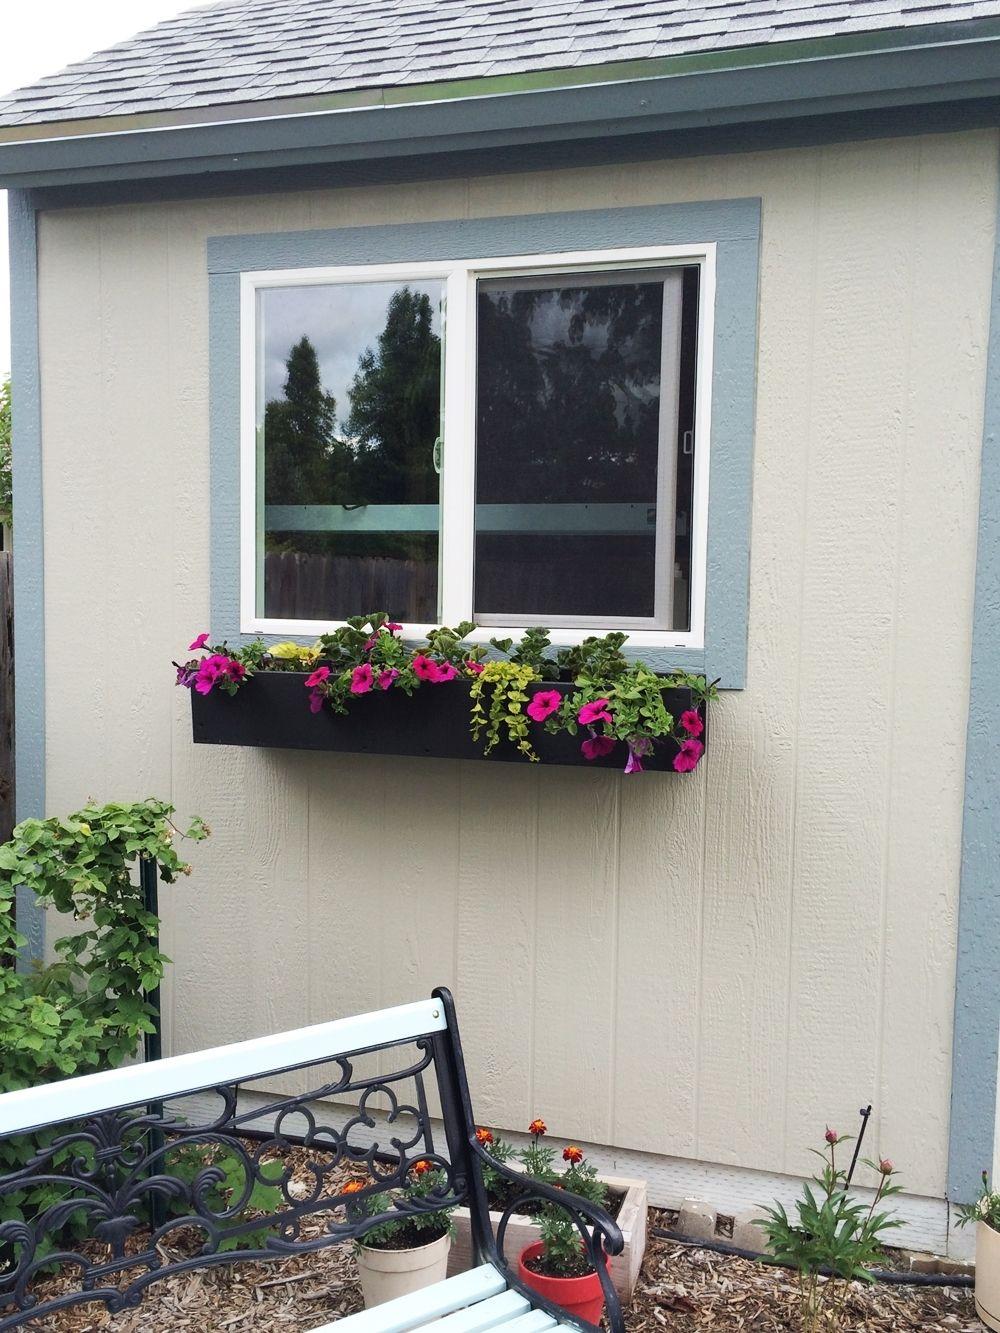 Make Your Own Planter Box